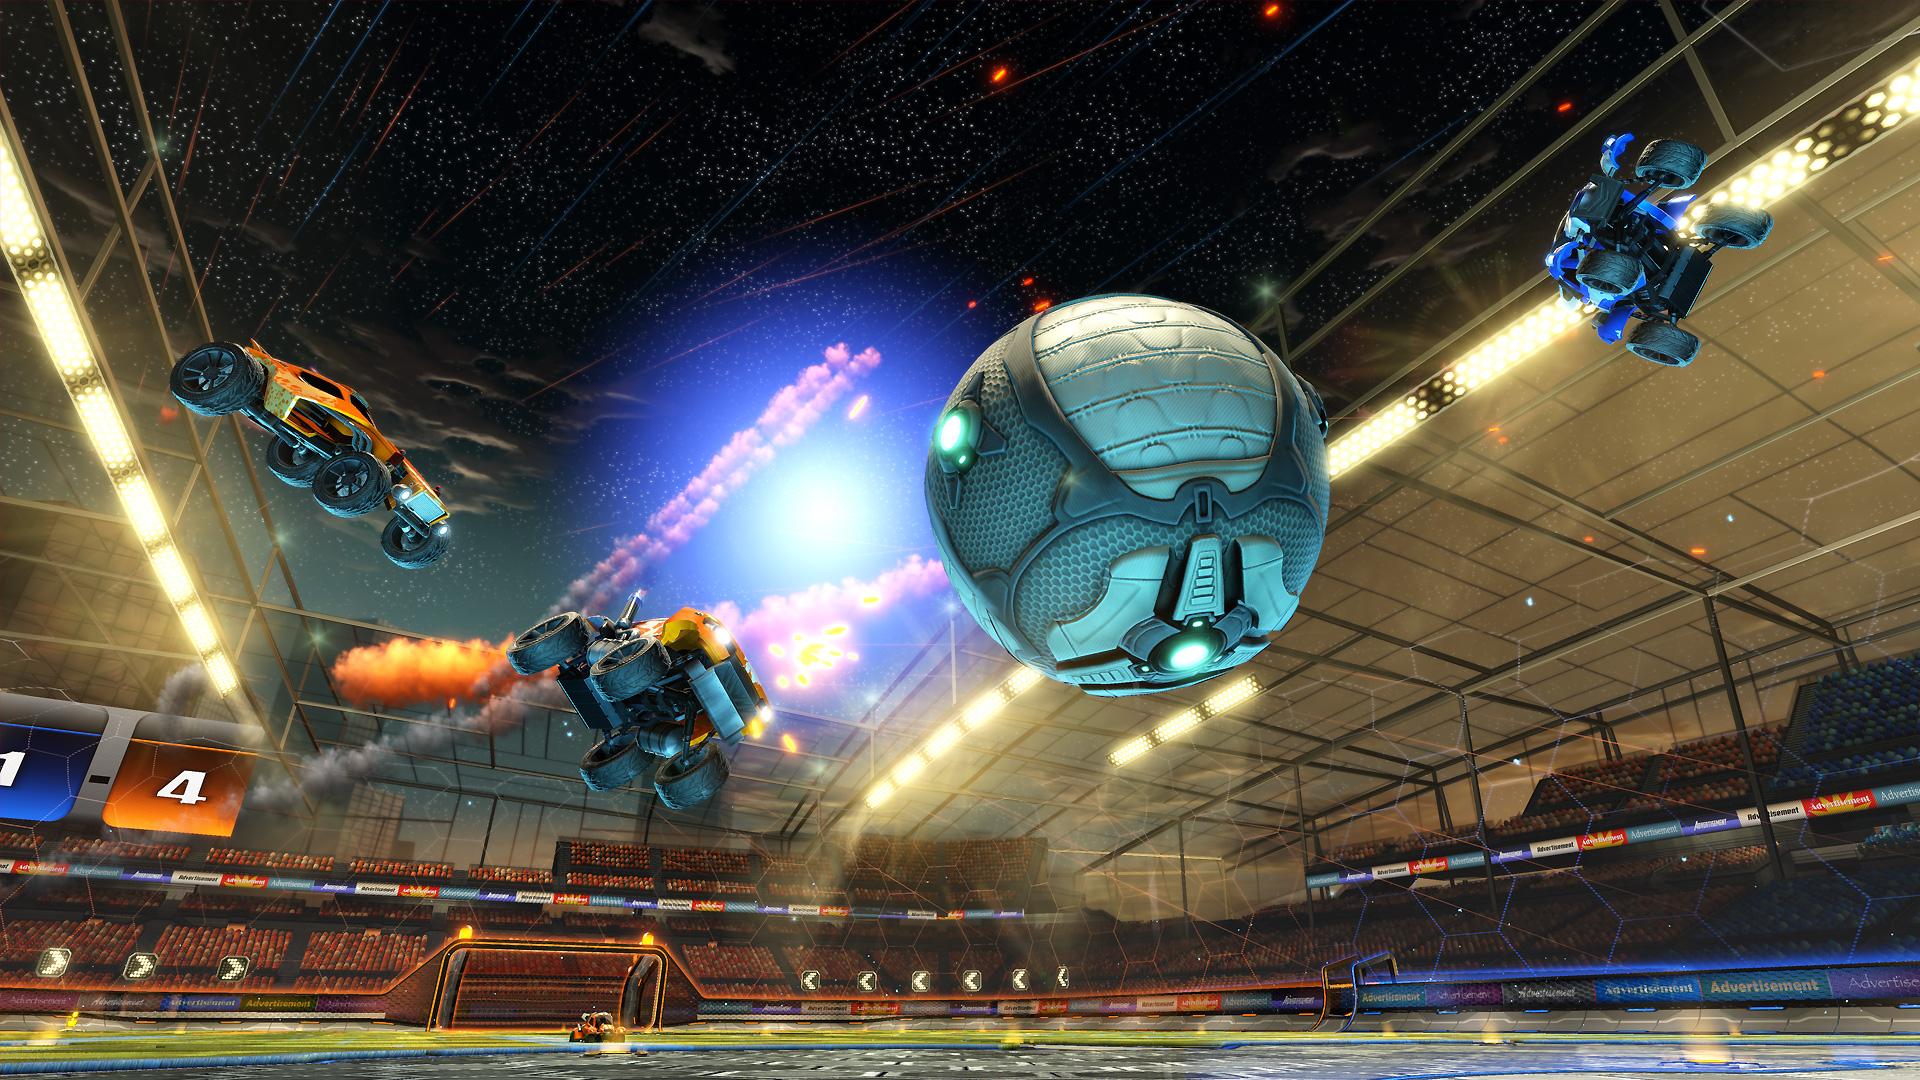 rocket league video game hd wallpaper 61728